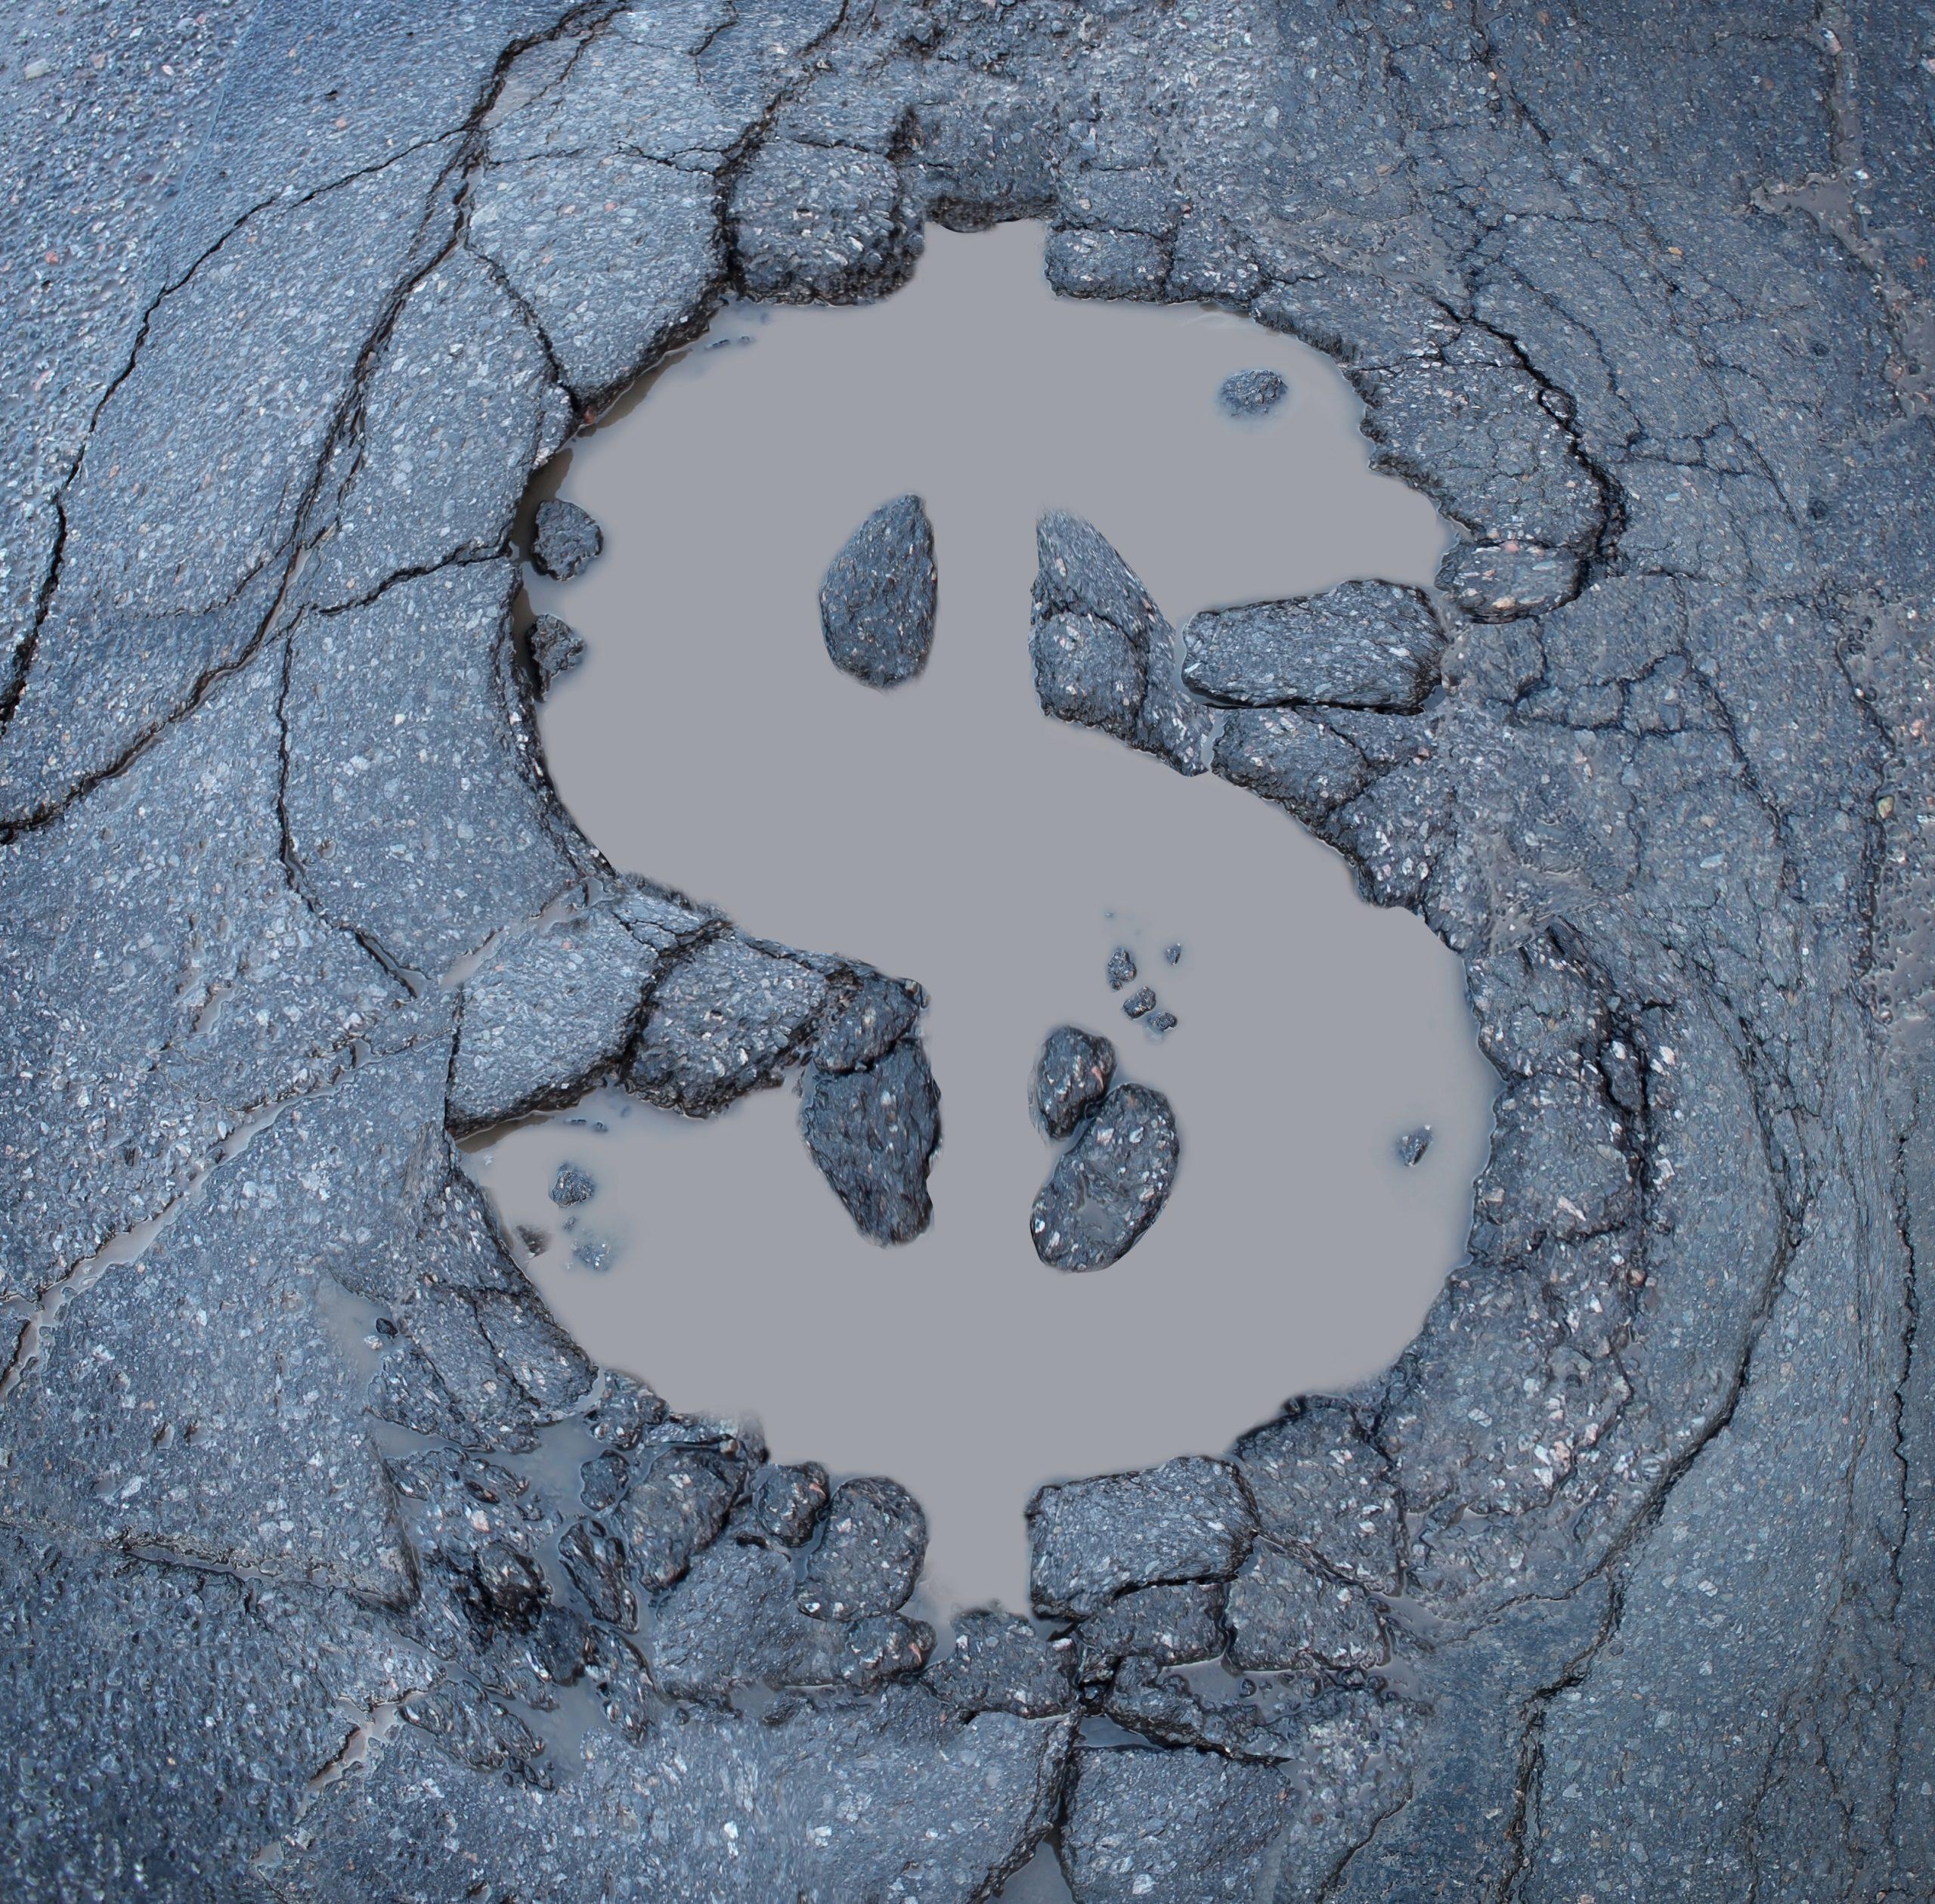 asphalt budget